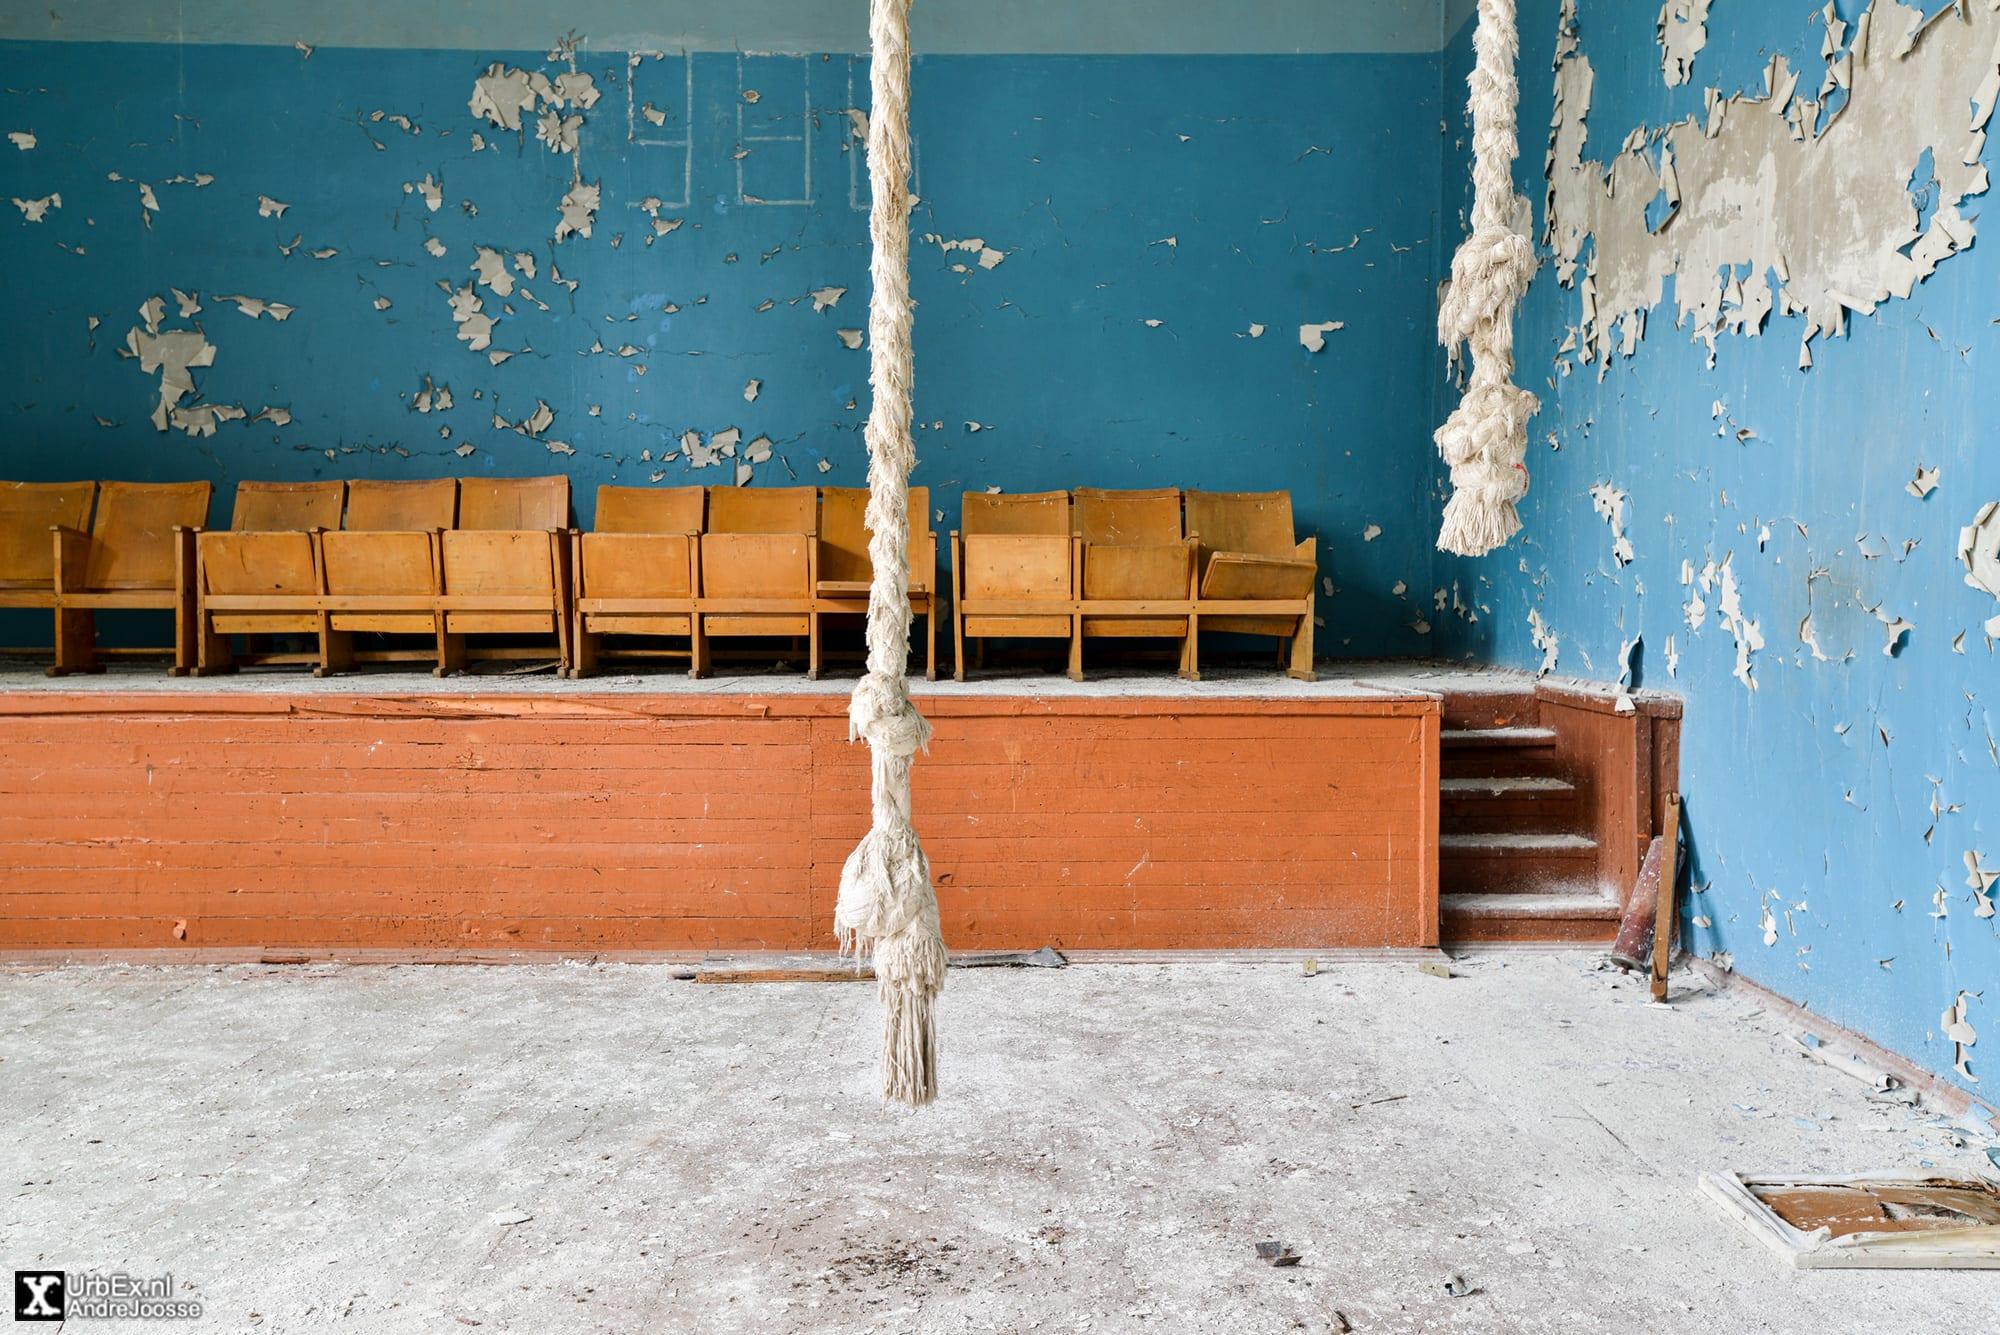 Chernobyl-2 School